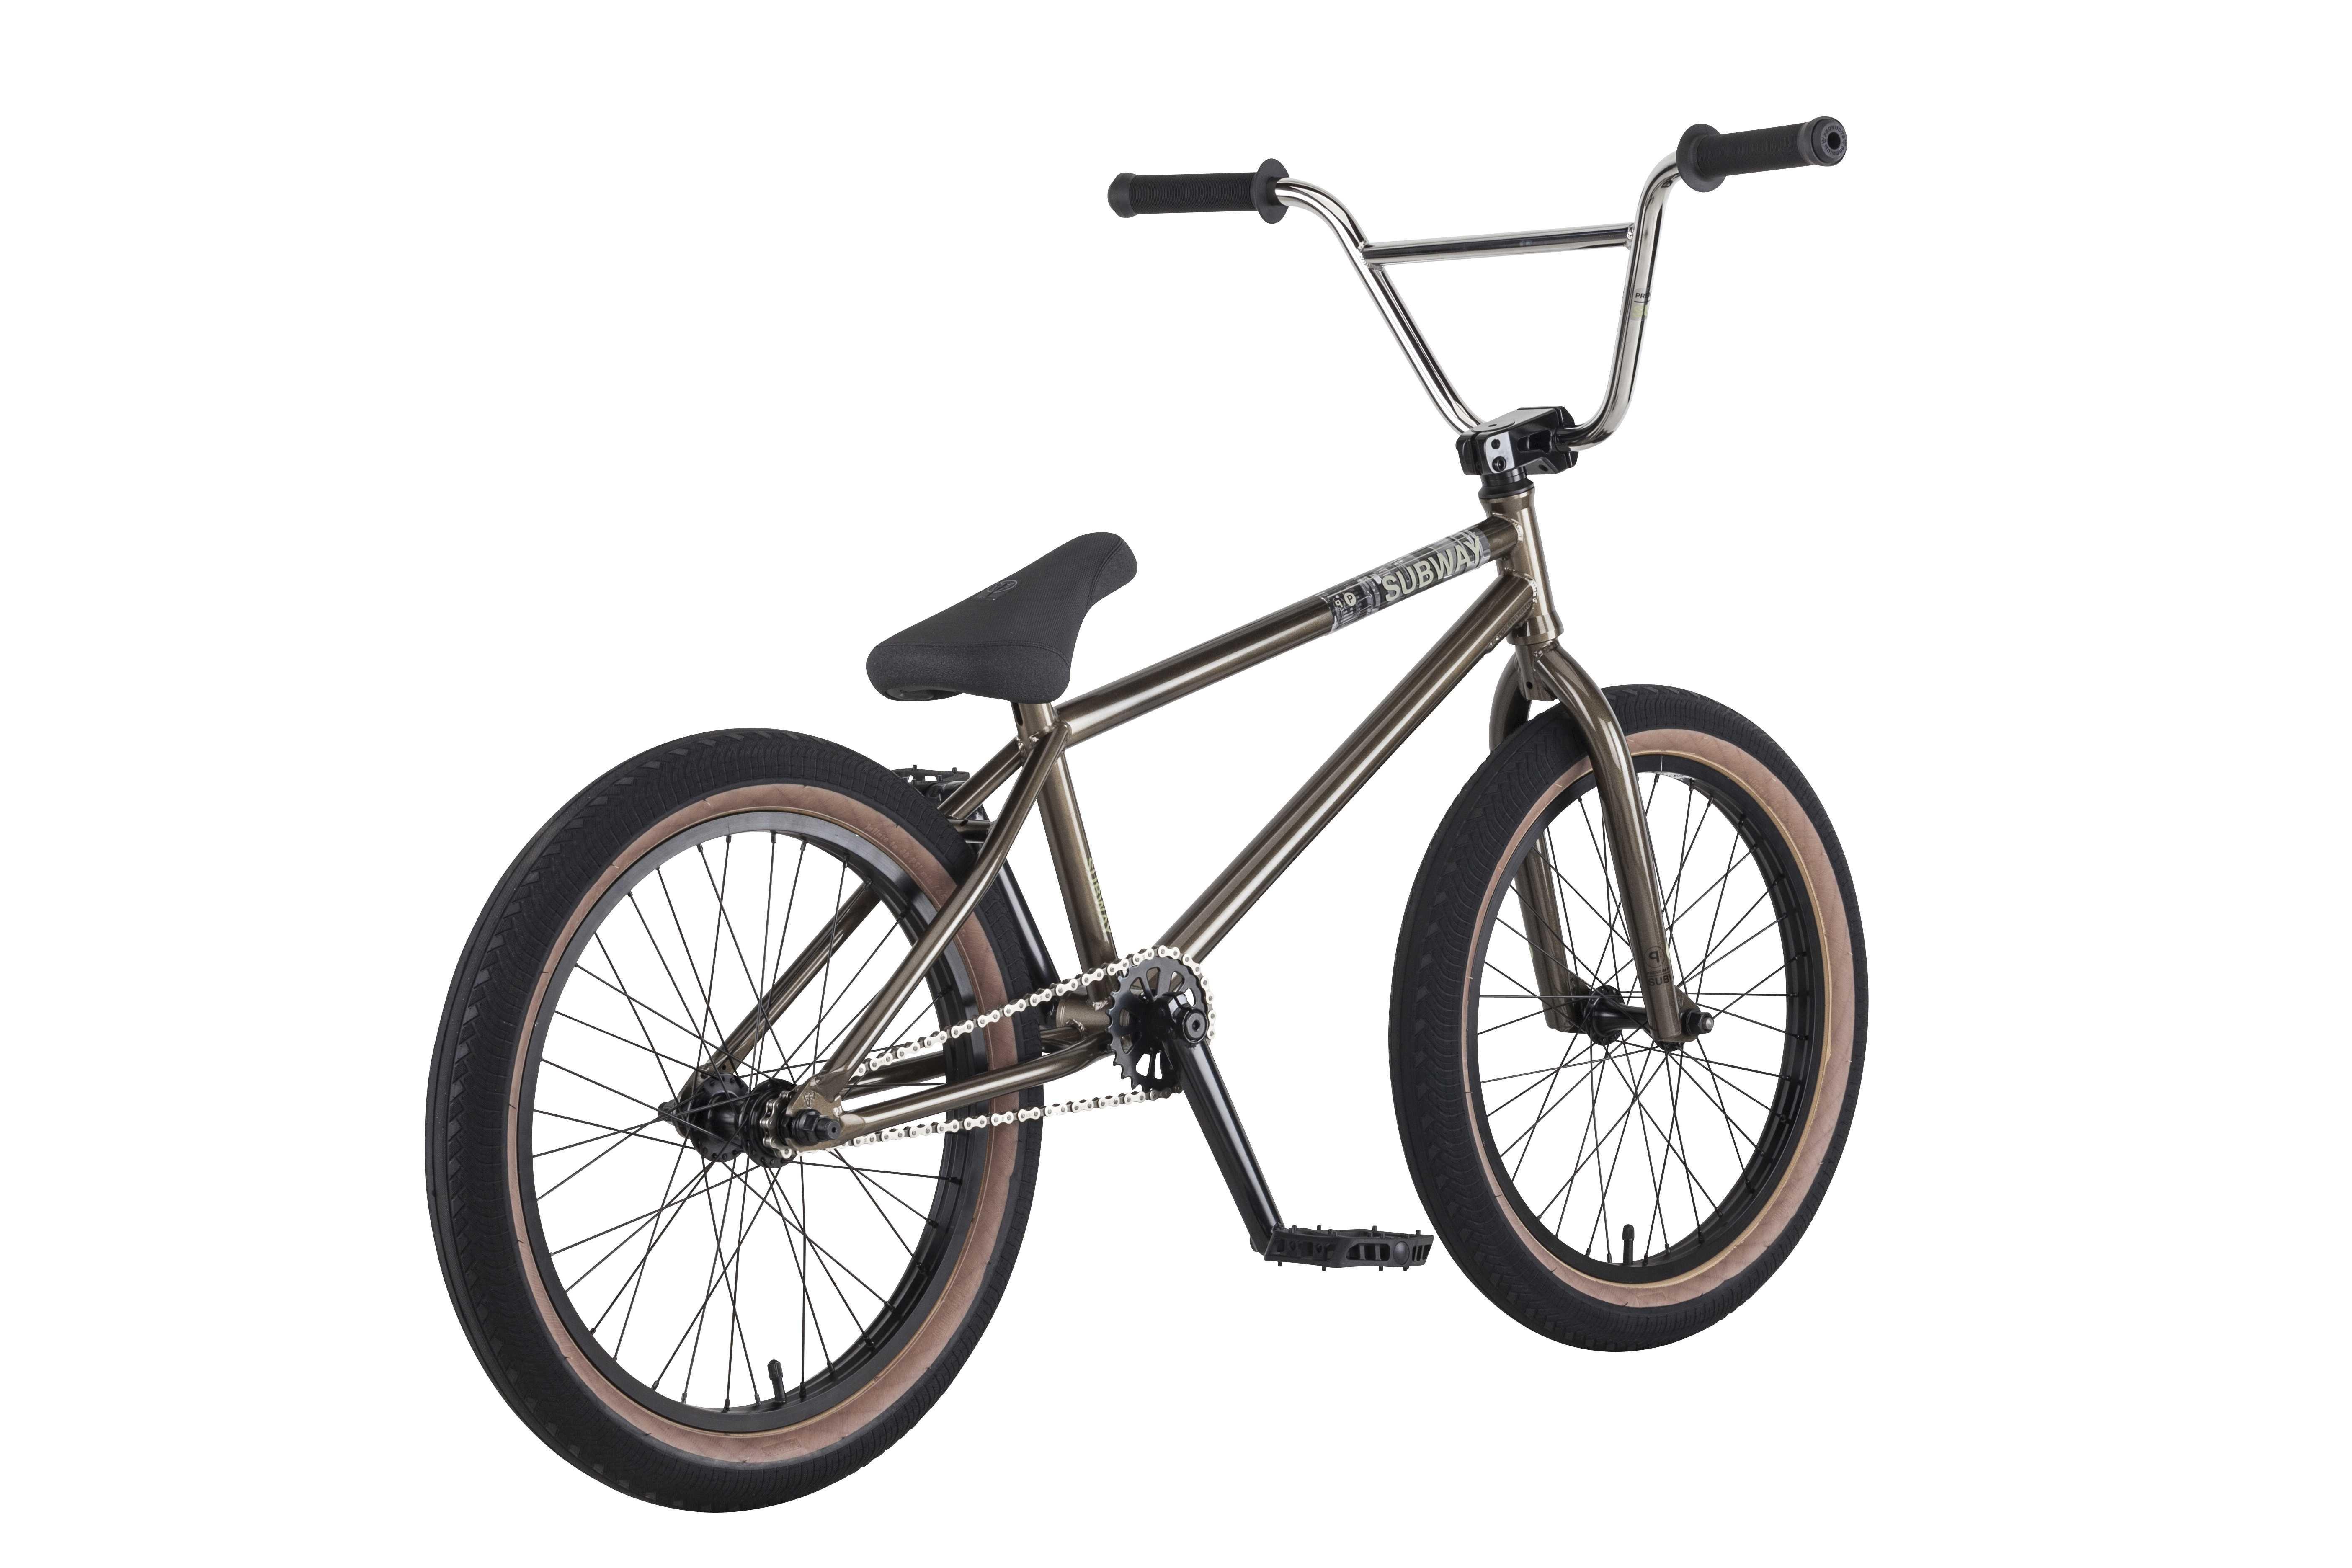 велокомп сигма 500 схема настройки